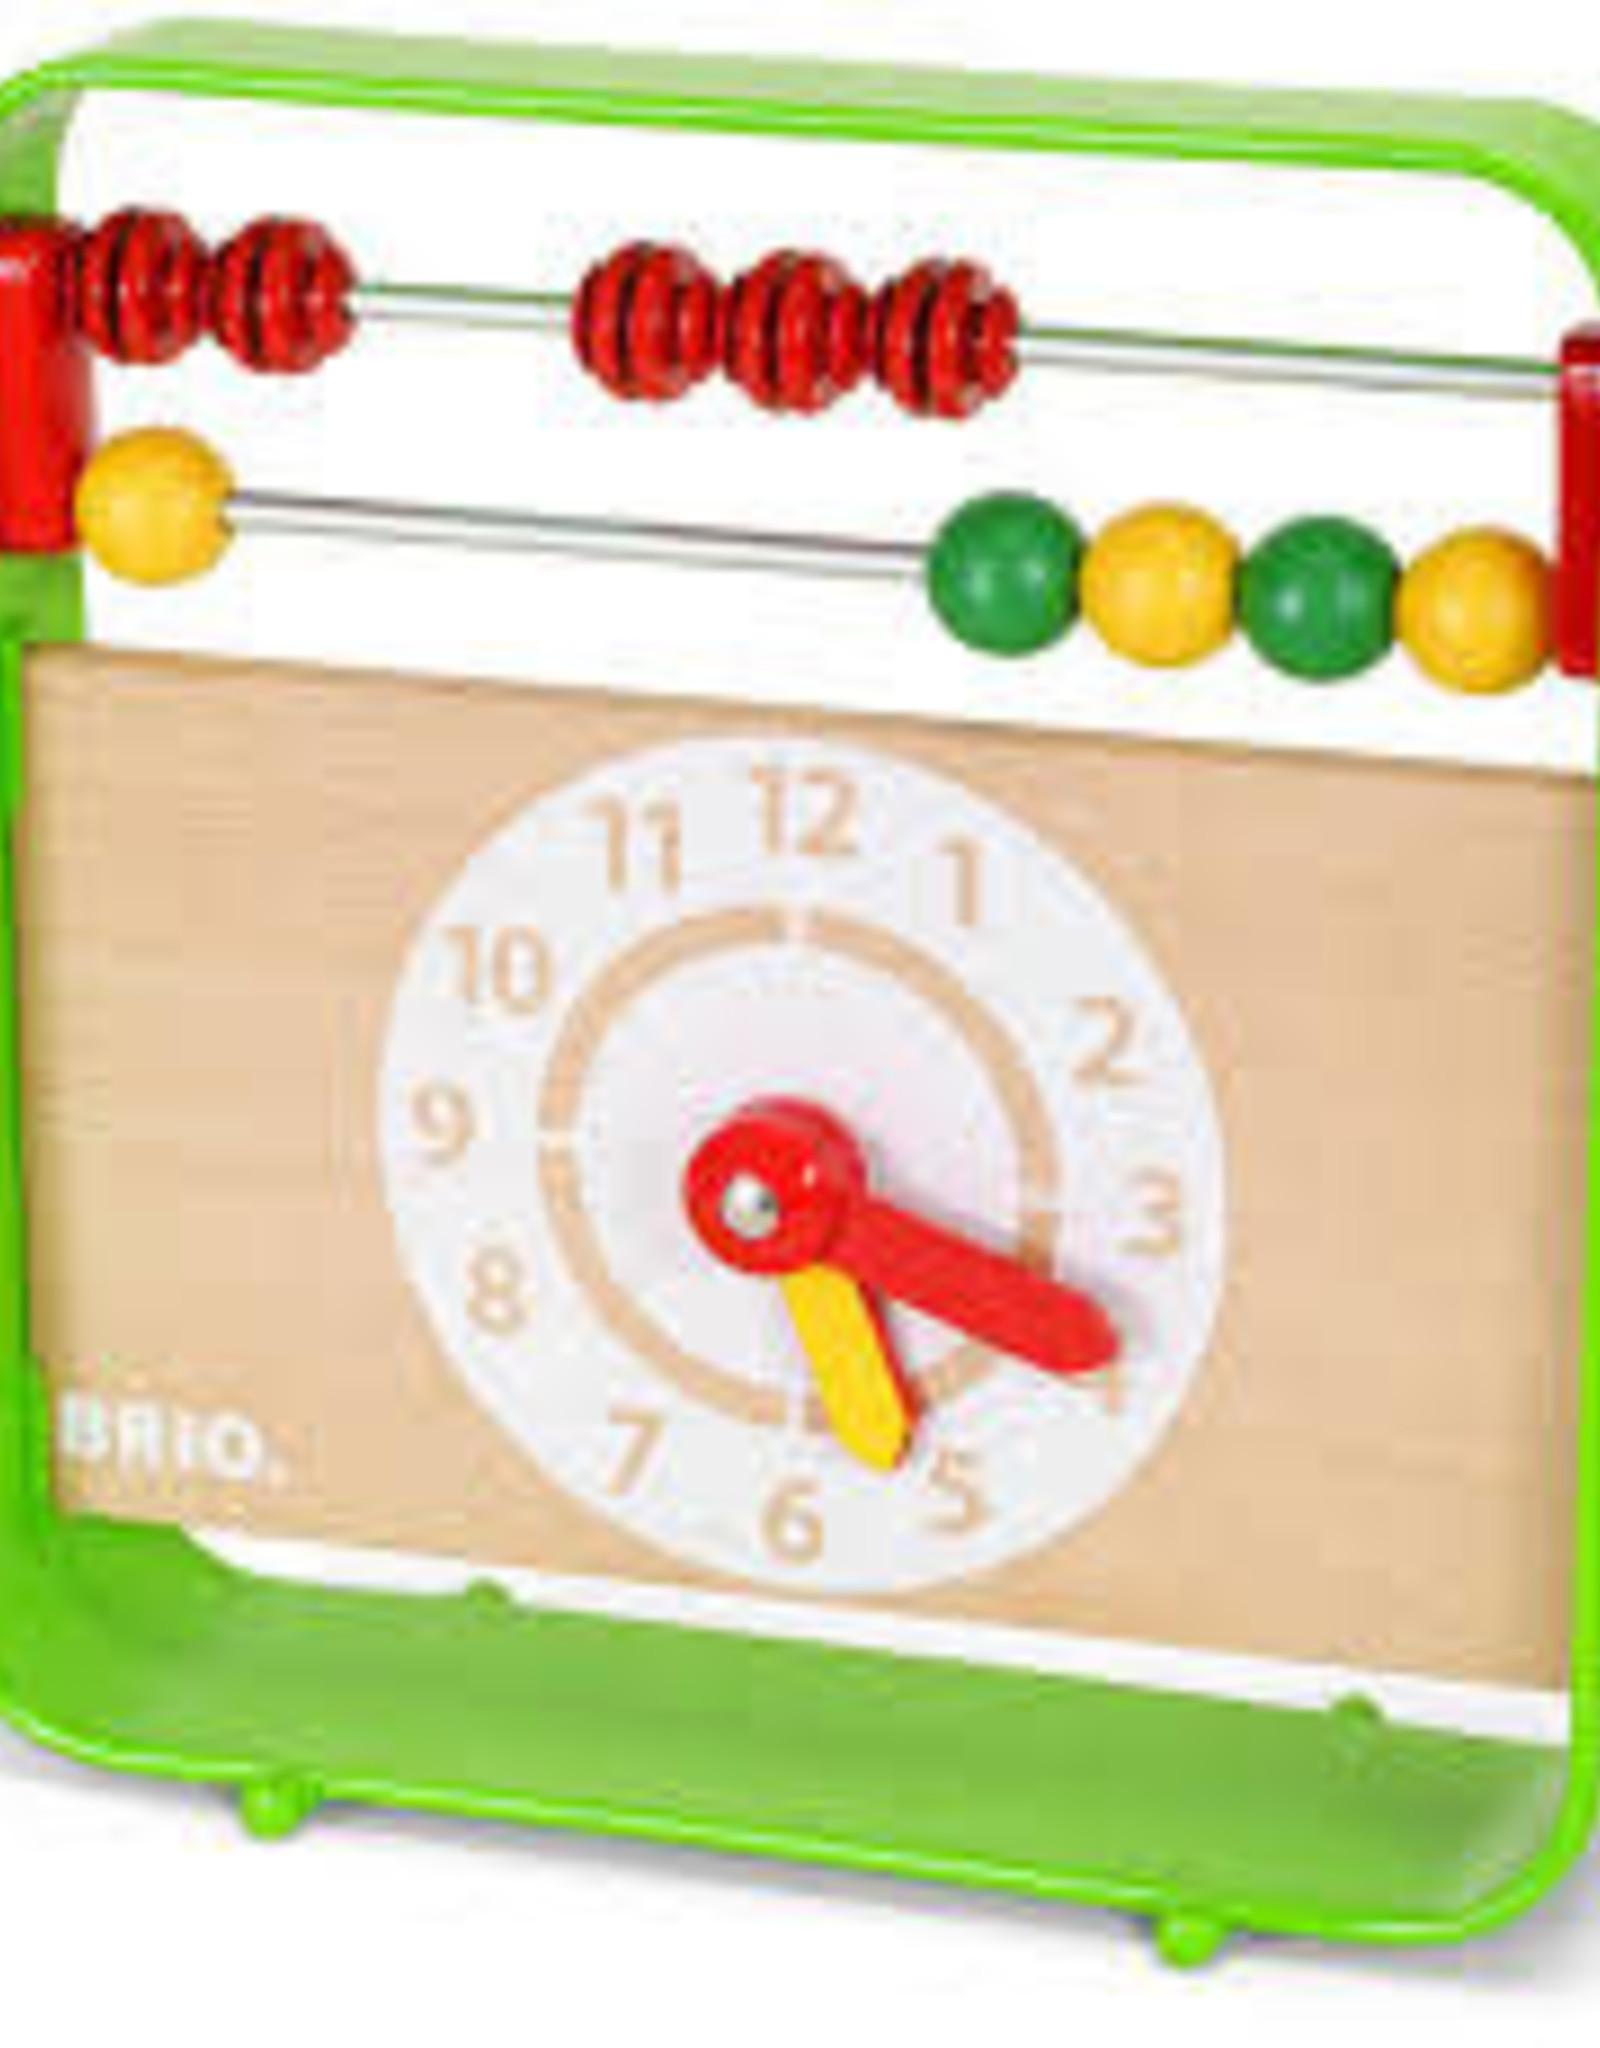 Ravensburger Ravensburger Wooden Abacus with Clock